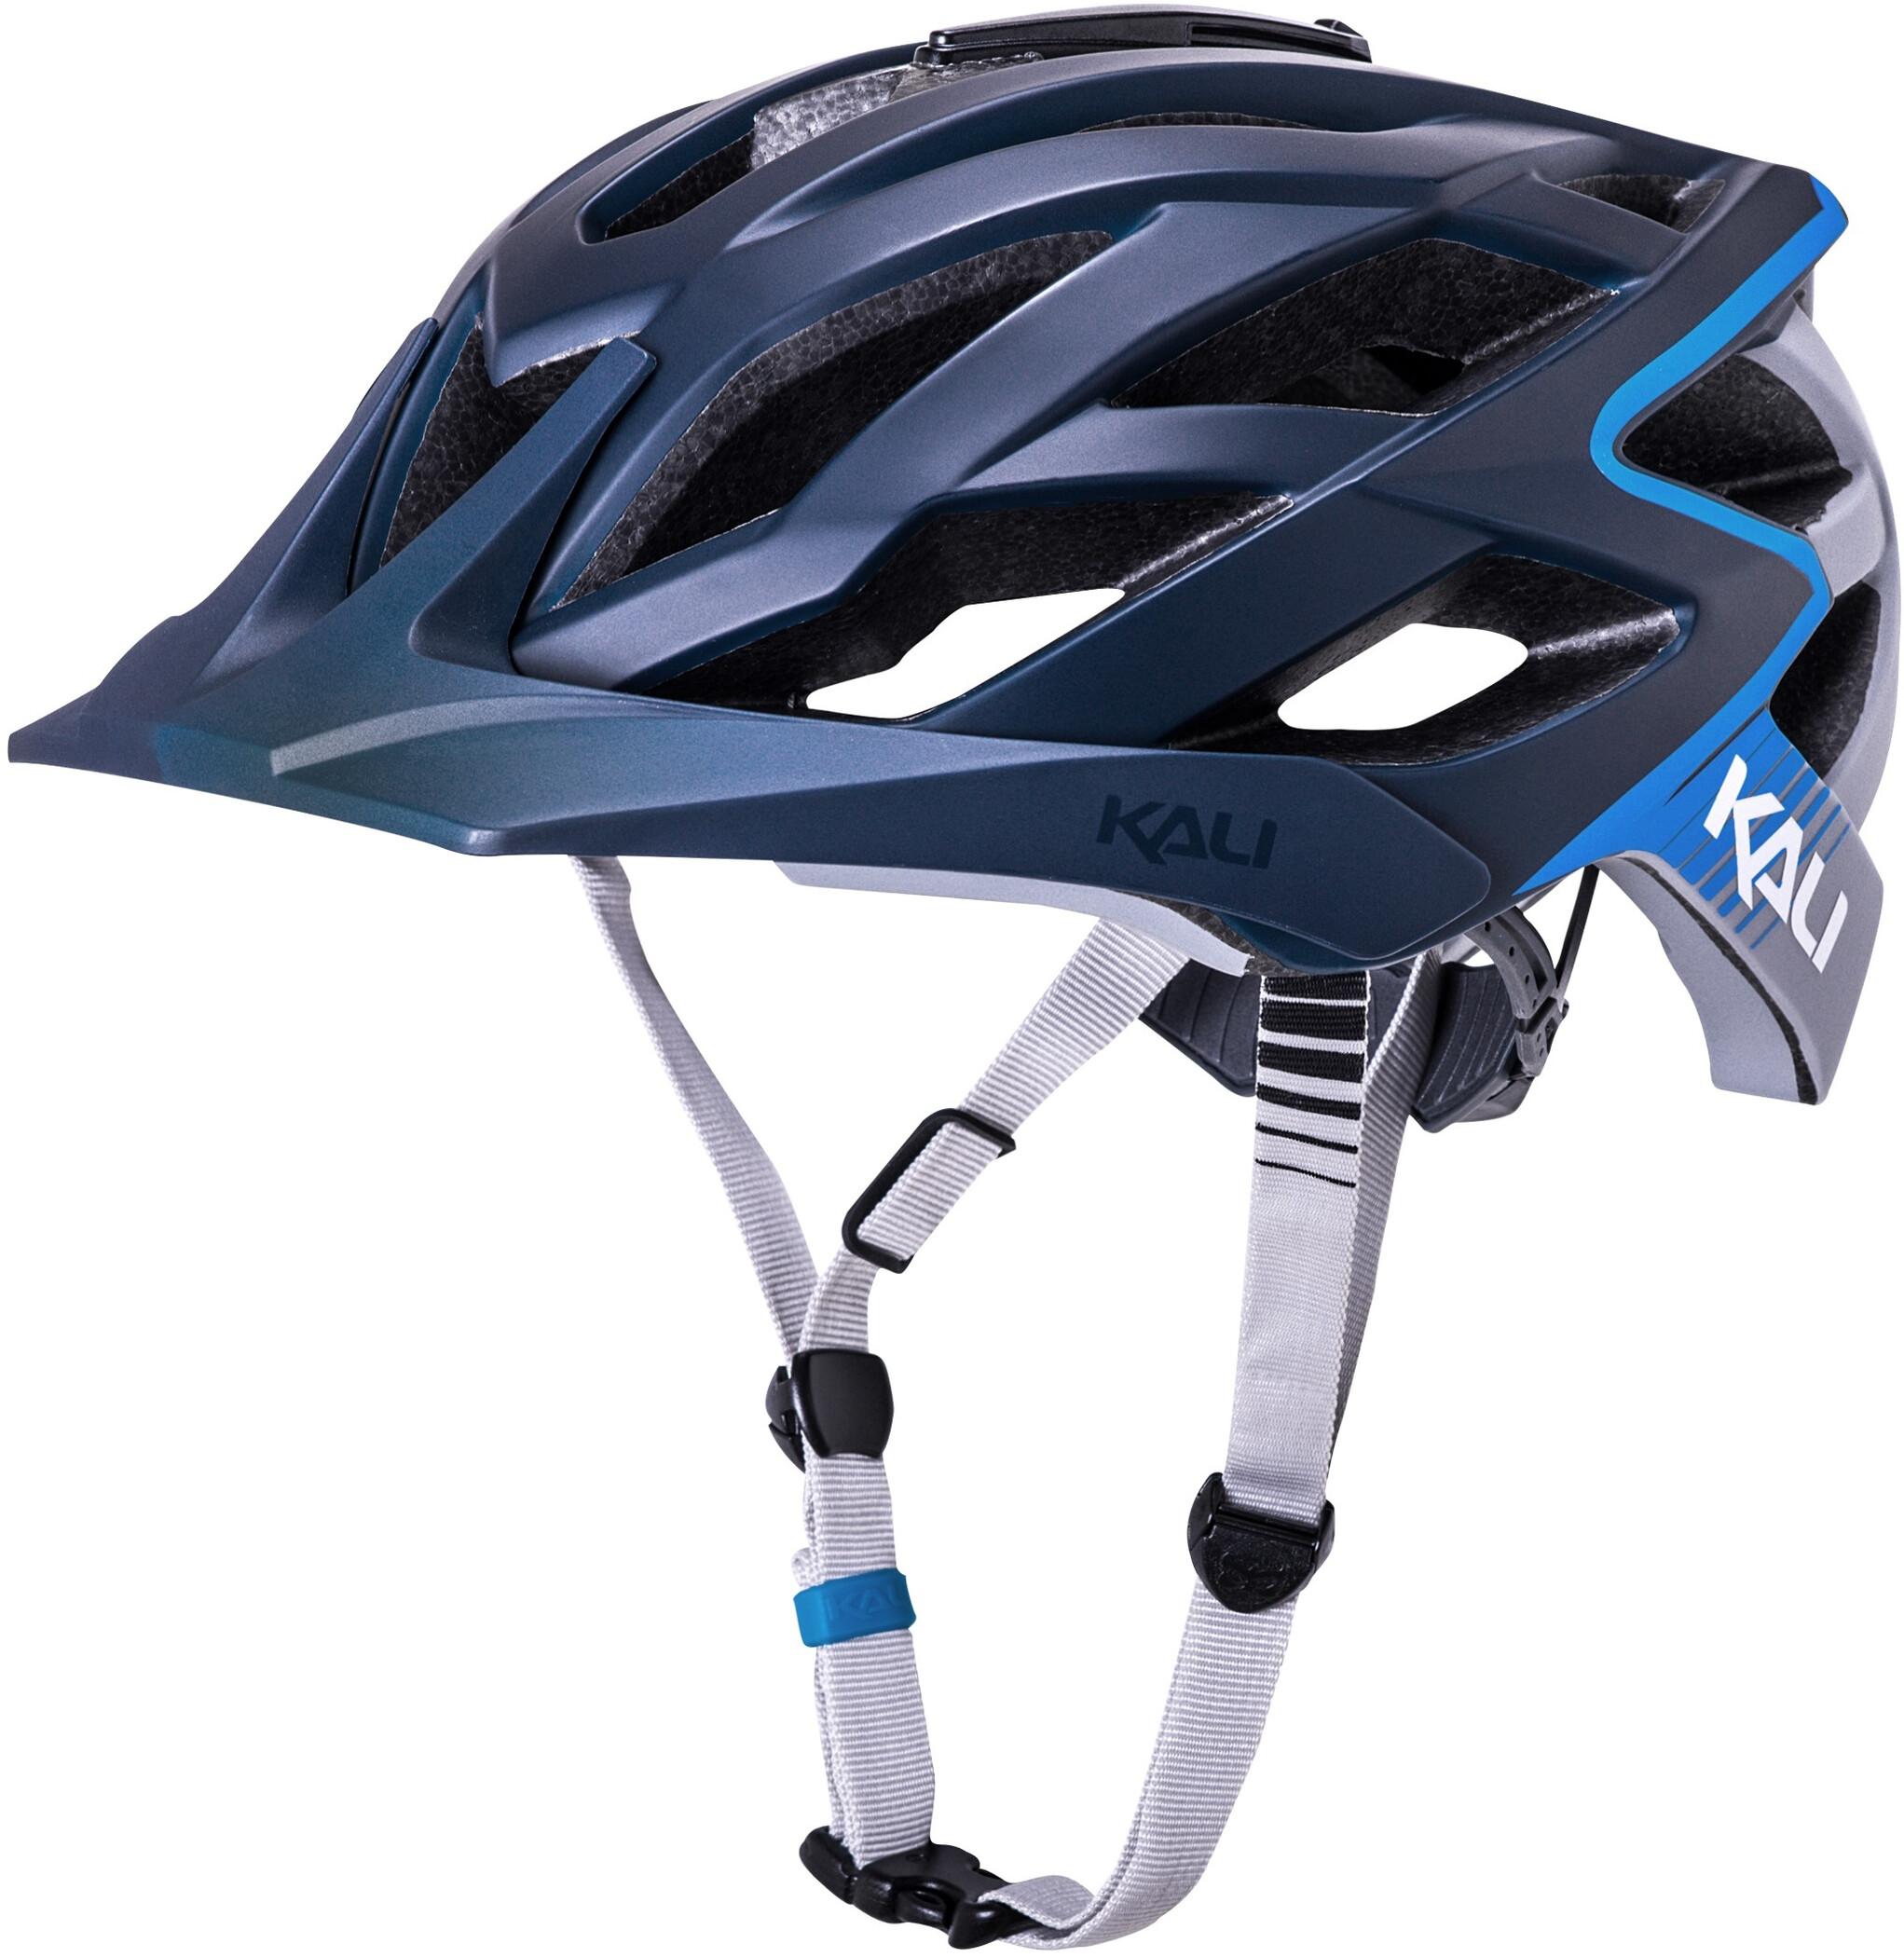 Kali Lunati Cykelhjelm, matte blue/grey   Hjelme